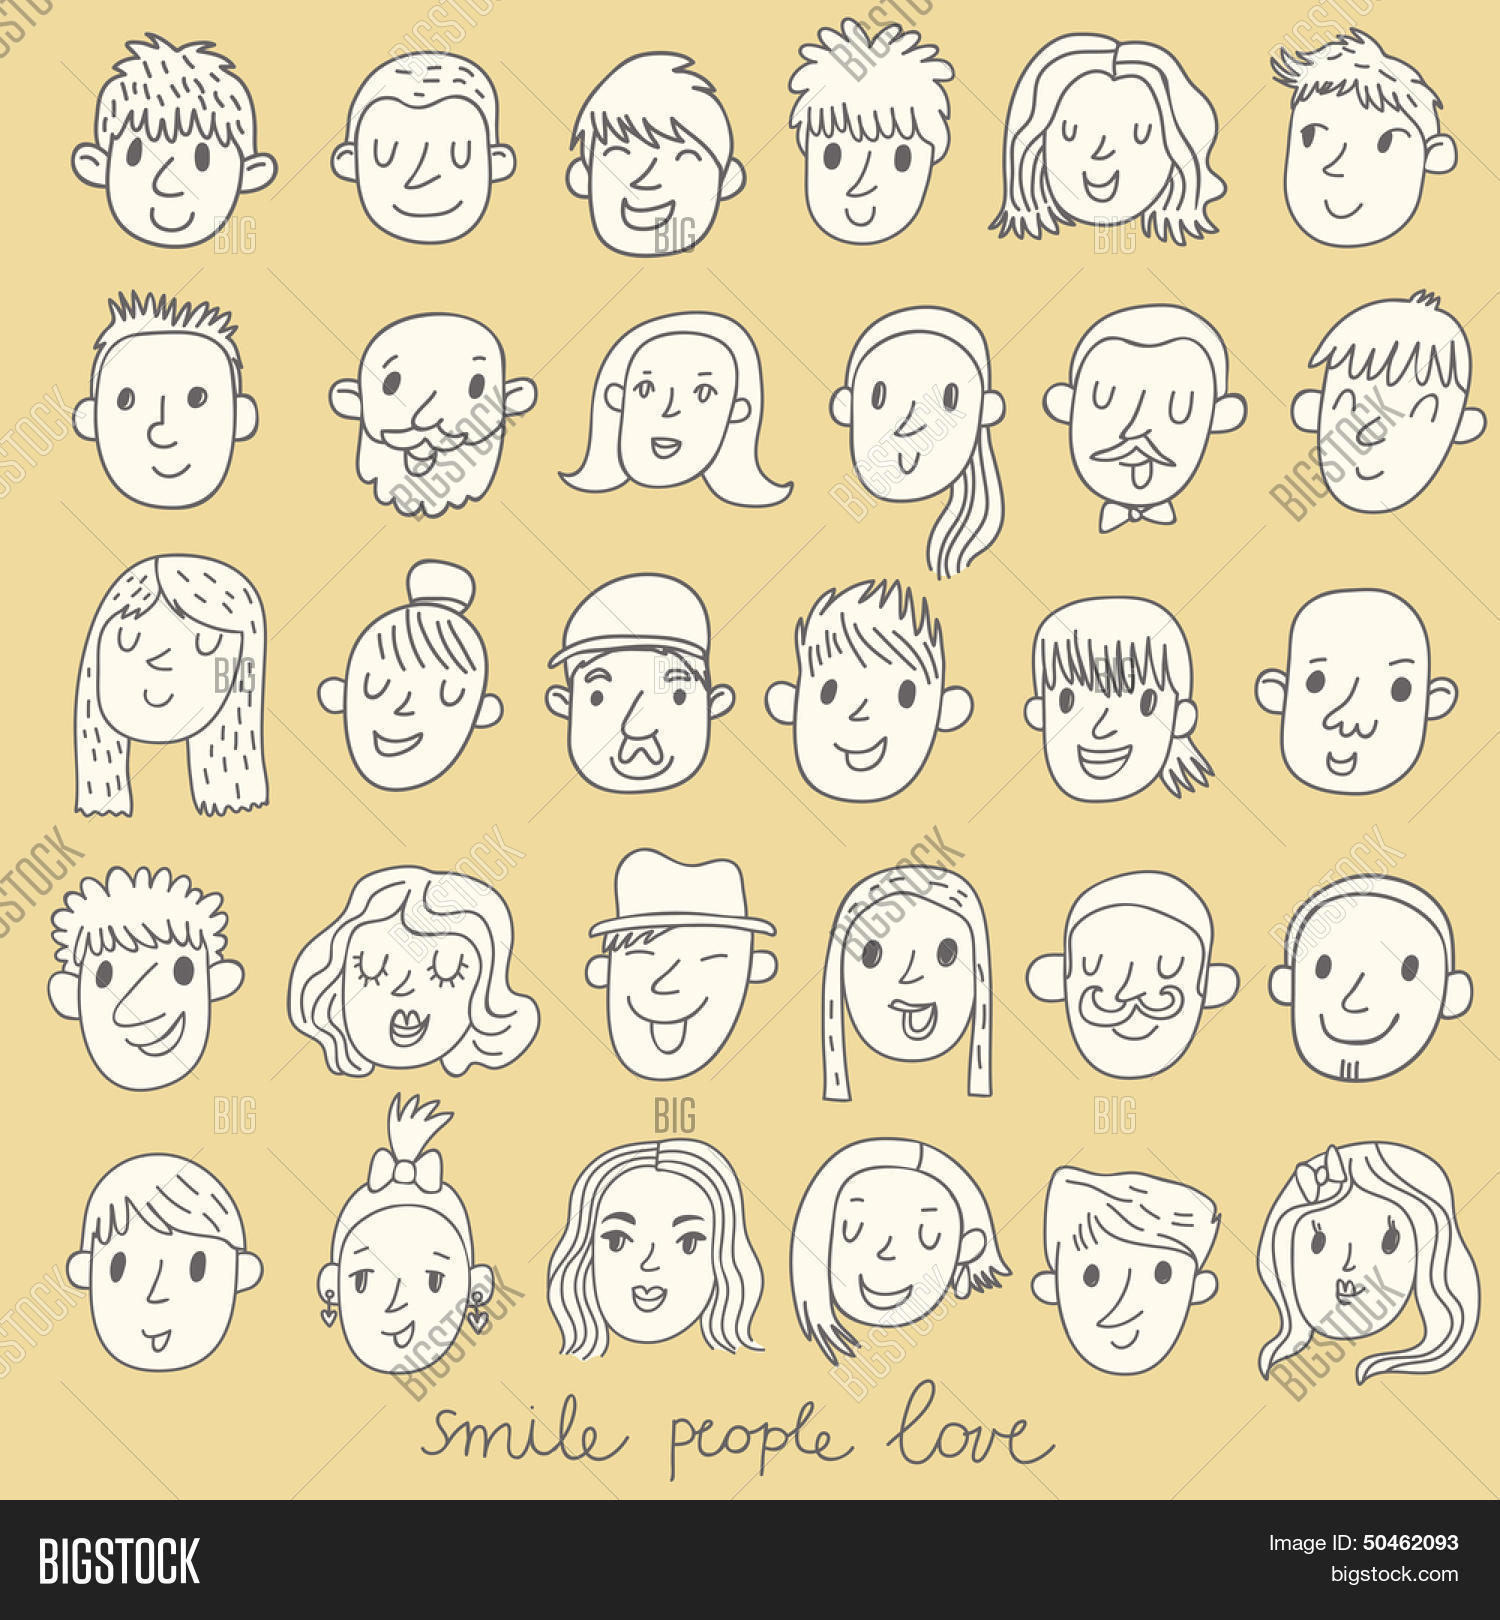 Funny Cartoon Images Of Boys 25 funny cartoon vector & photo (free trial) | bigstock